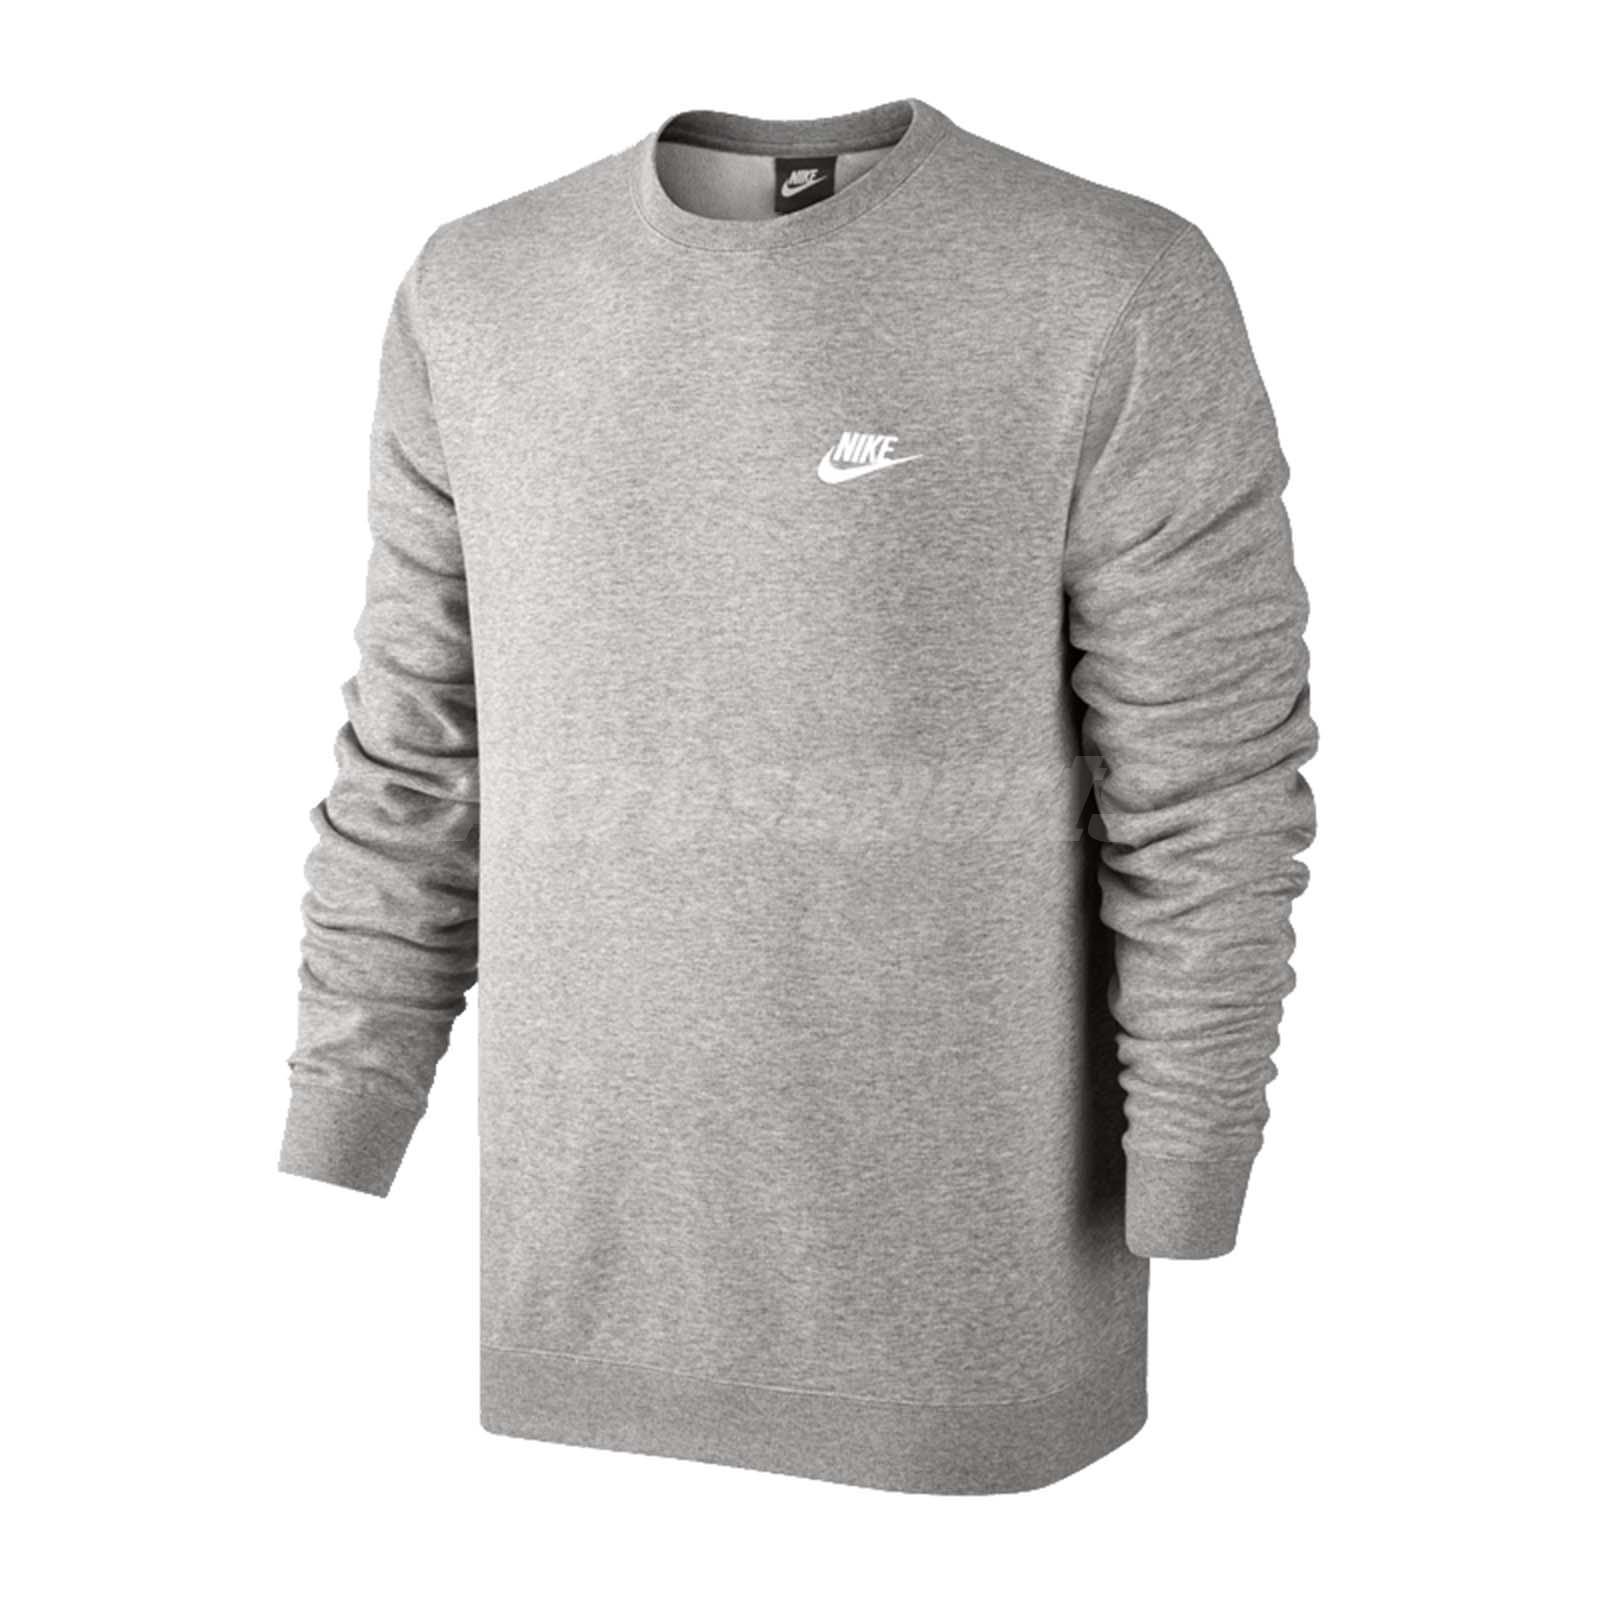 b1761e9bb909e Details about Nike Sportswear Crew French Terry Club Pullover Sweatshirt  Gym Grey 804343-063